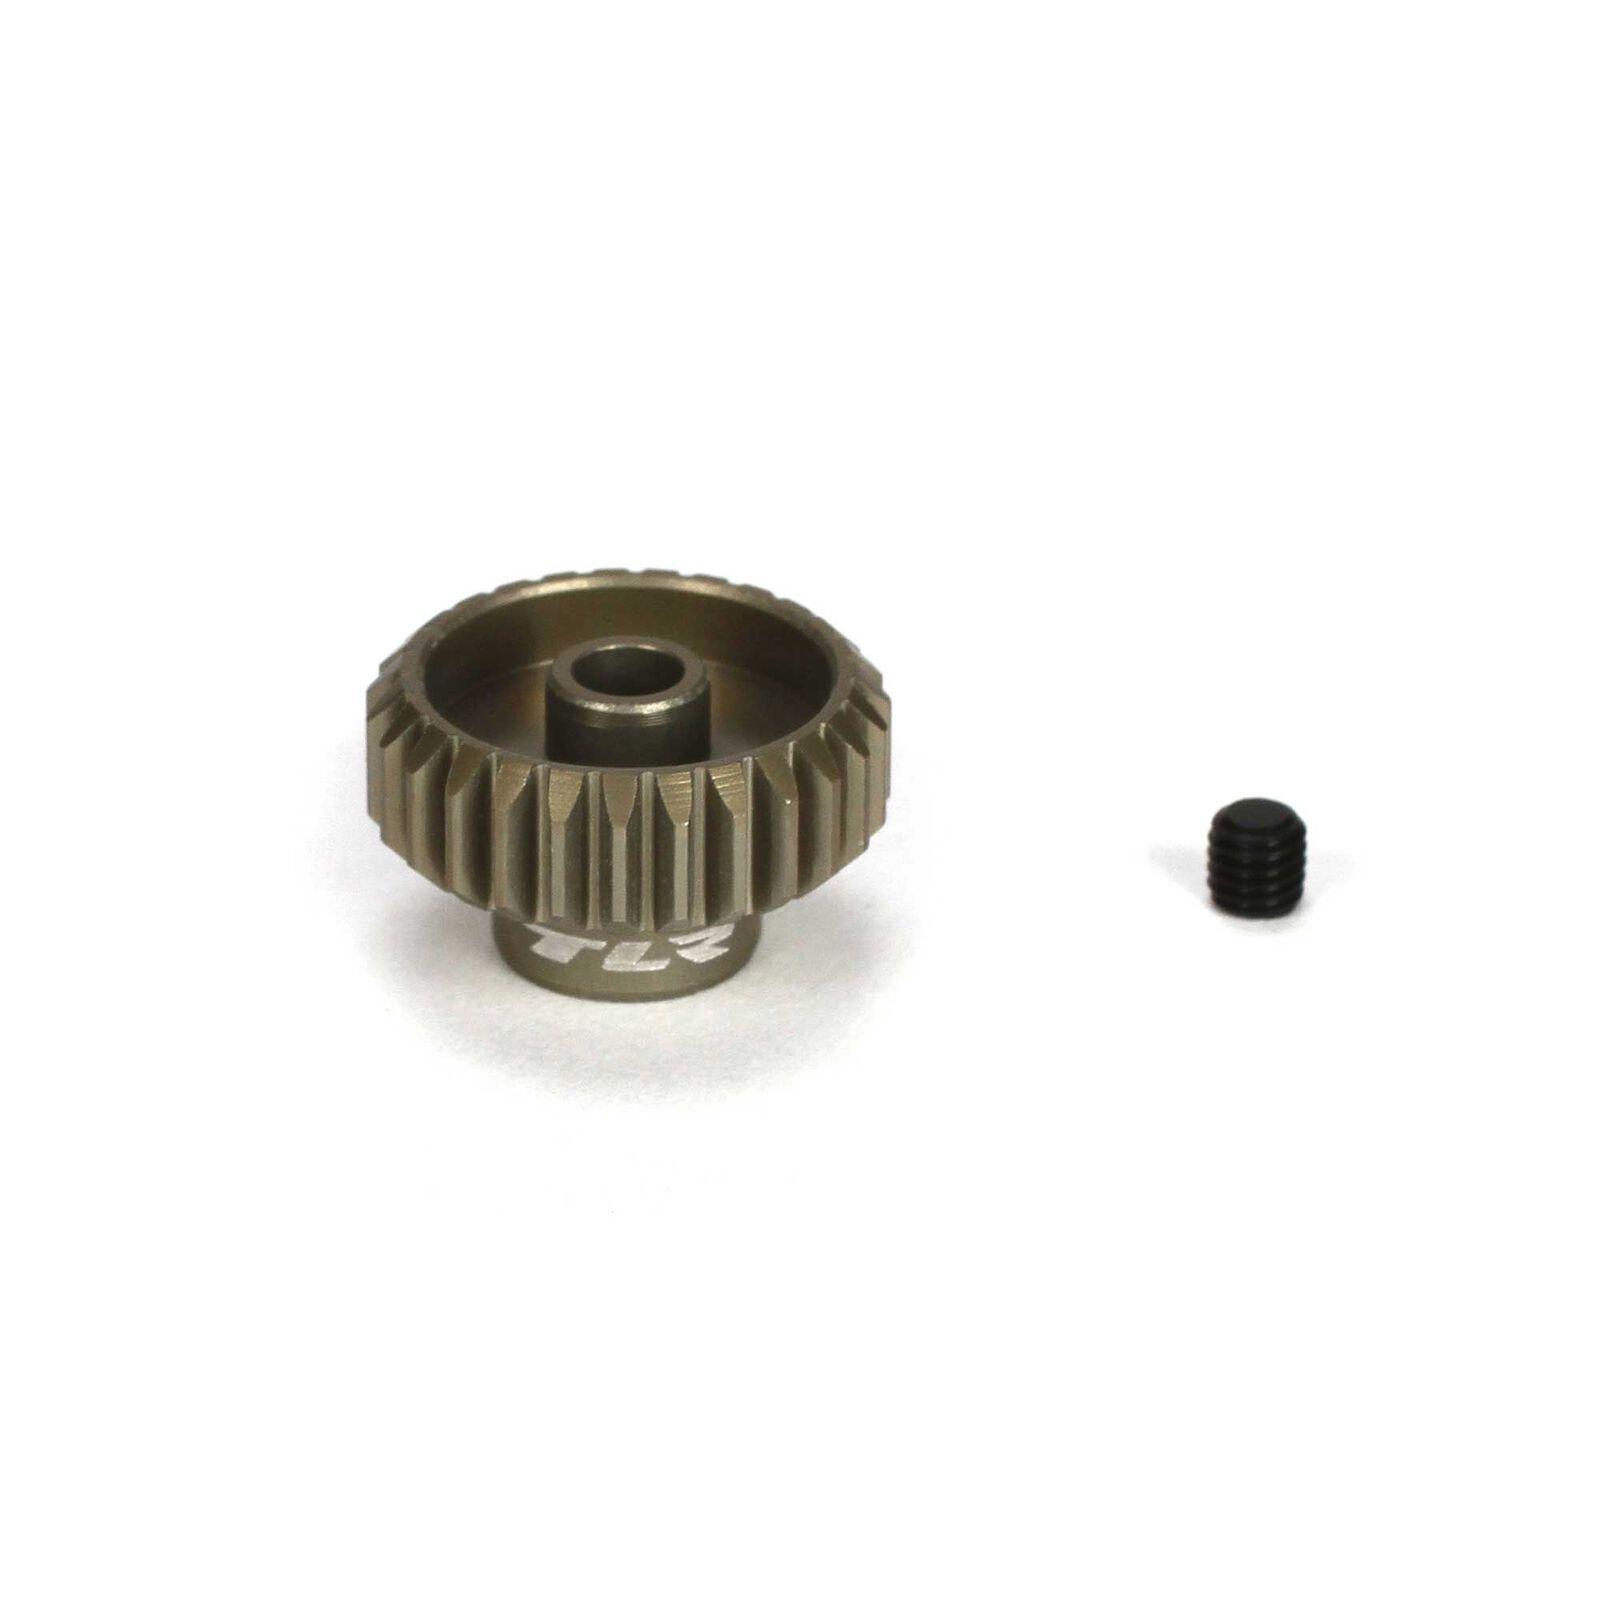 48P Aluminum Pinion Gear, 27T